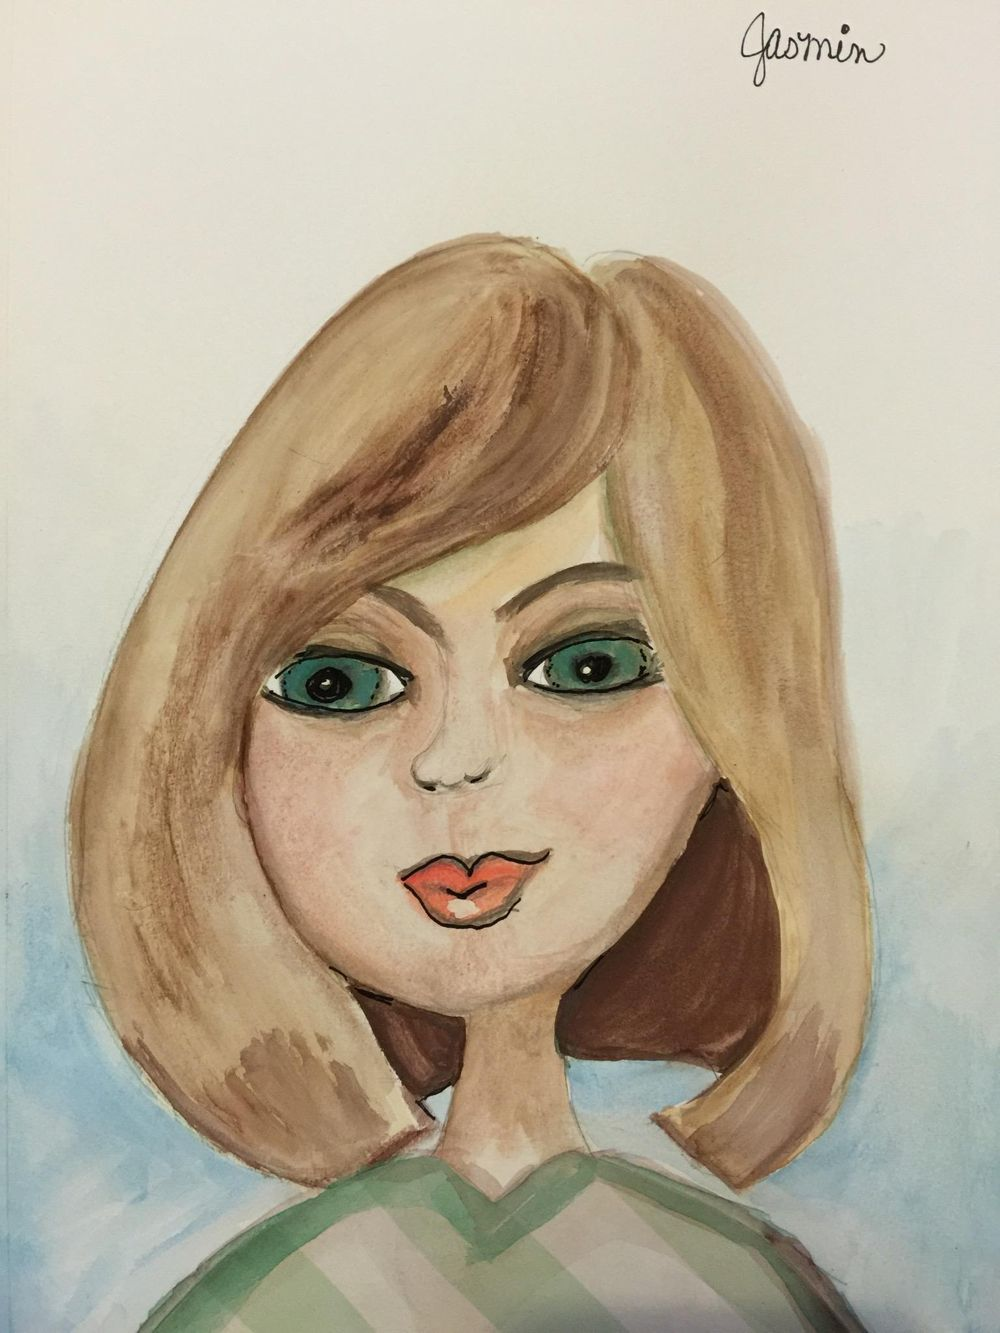 Jasmin - image 1 - student project